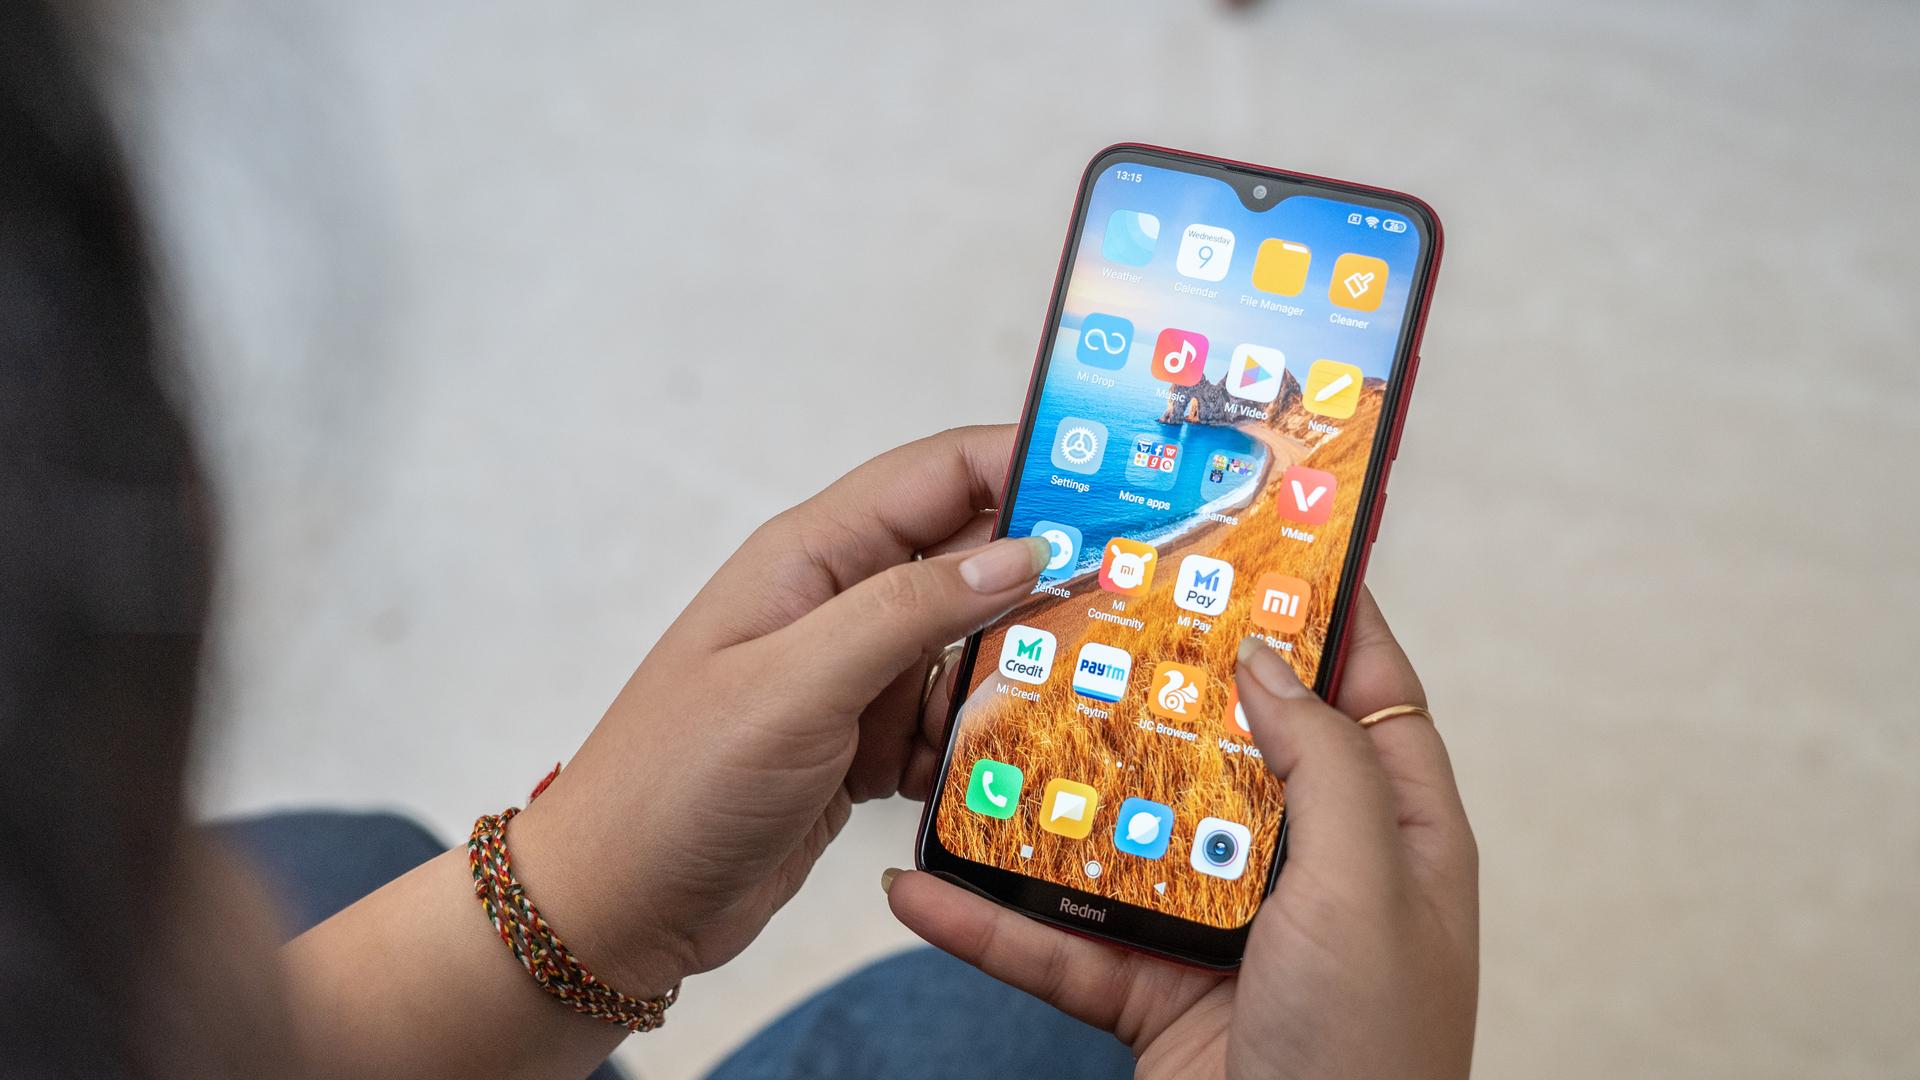 Redmi 8 in hand showing homescreen